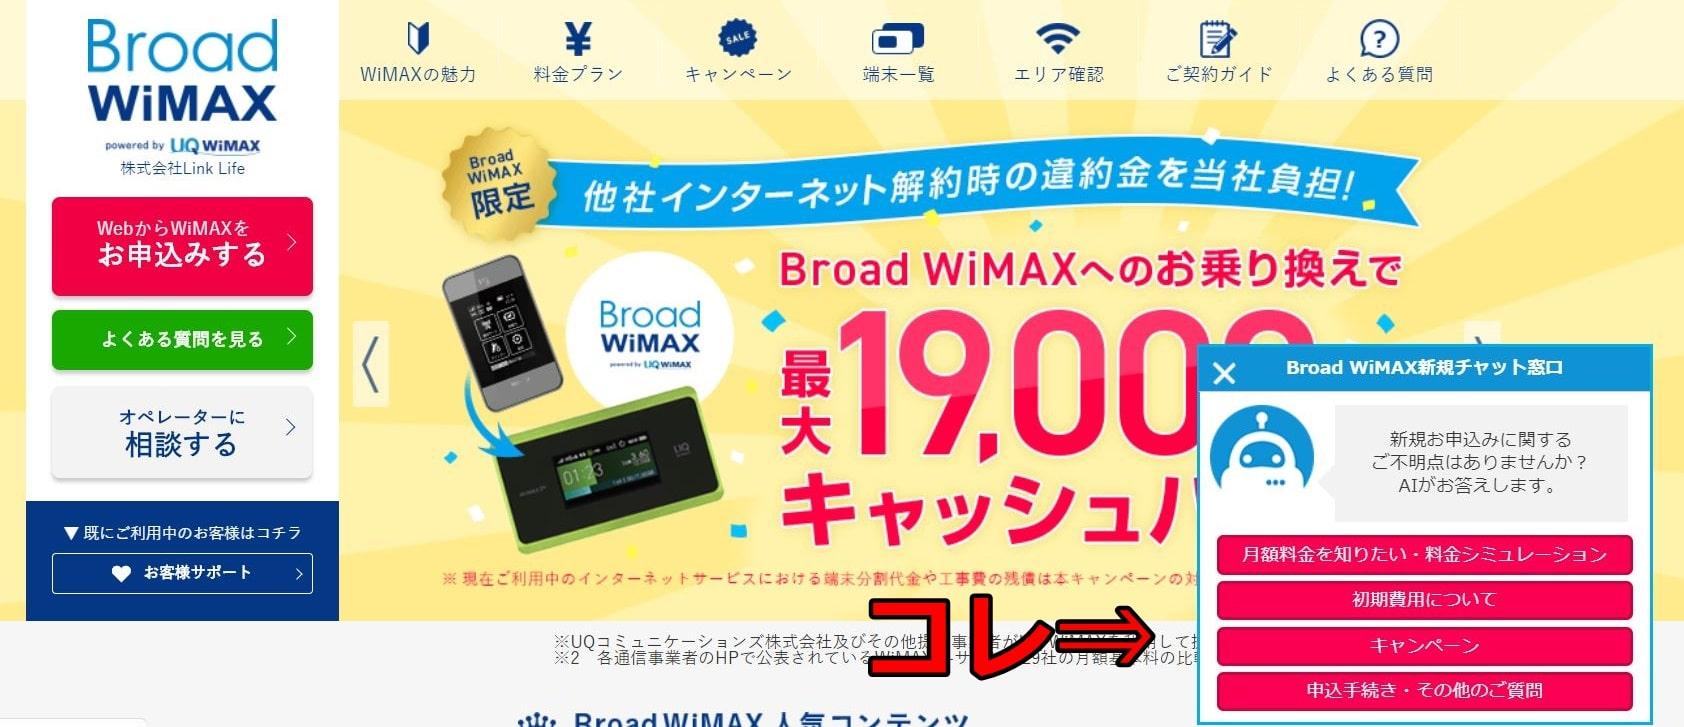 BroadWiMAX チャットサポート